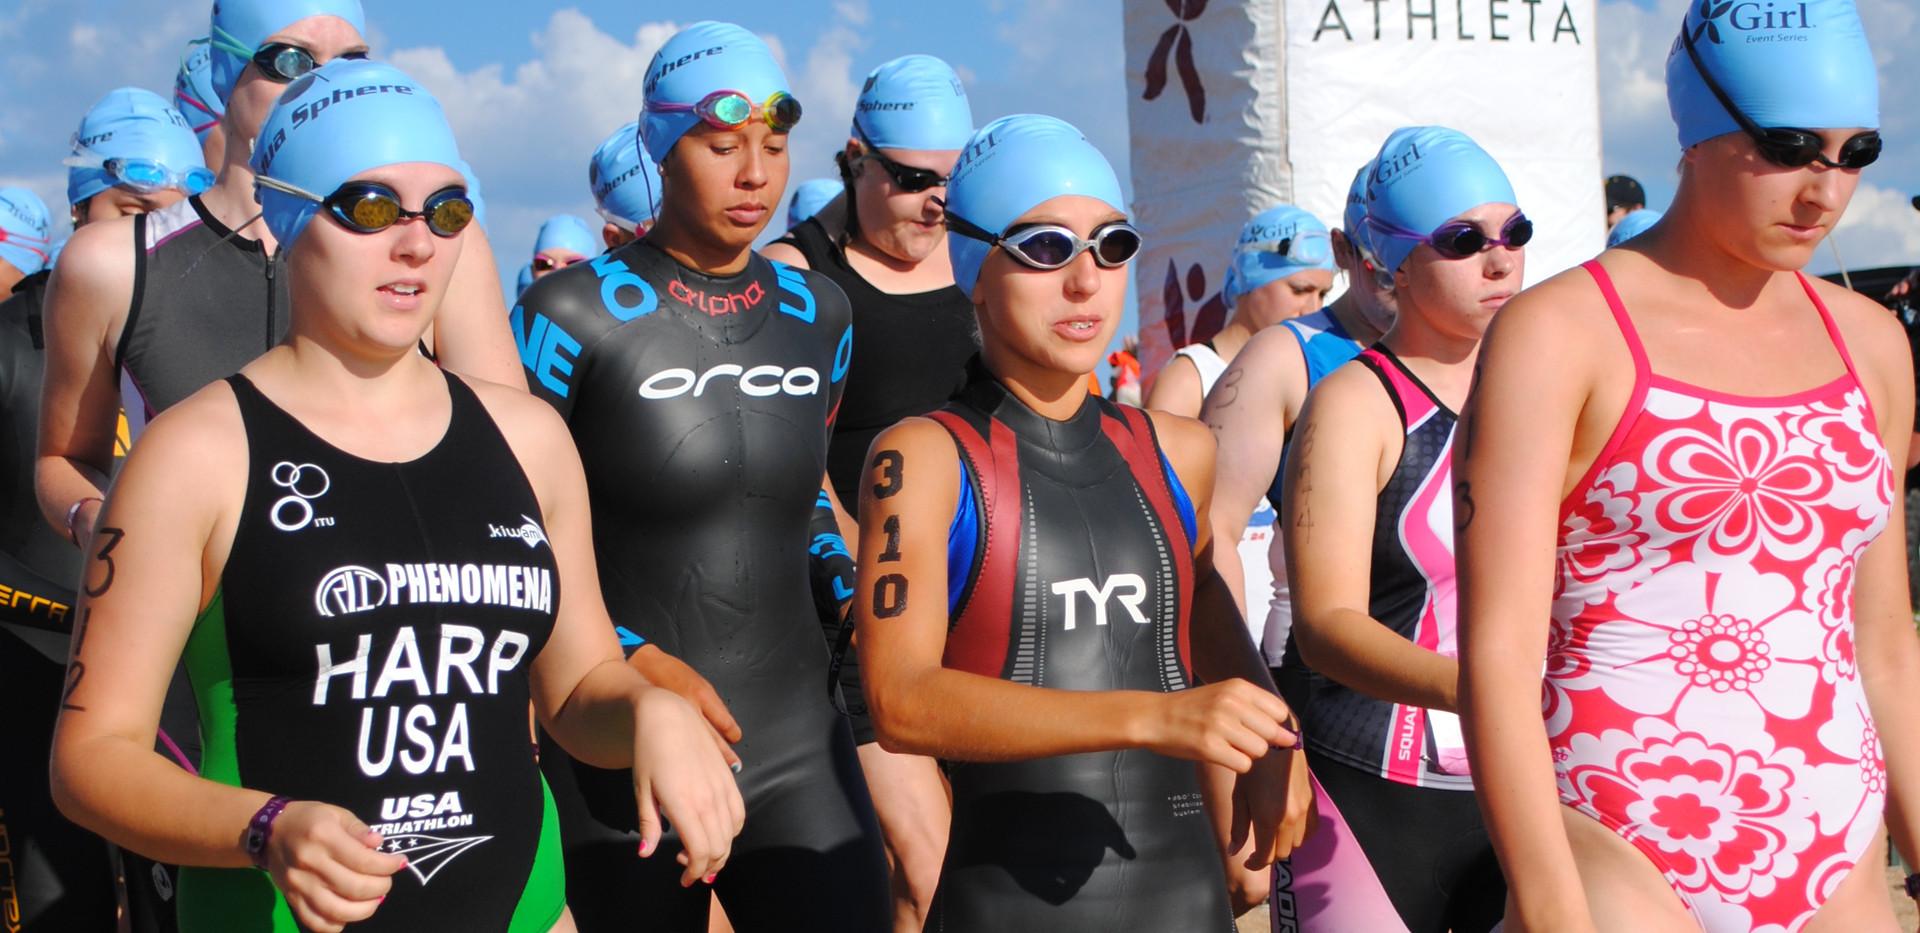 IronGirl Triathlon 2012- Boulder, CO